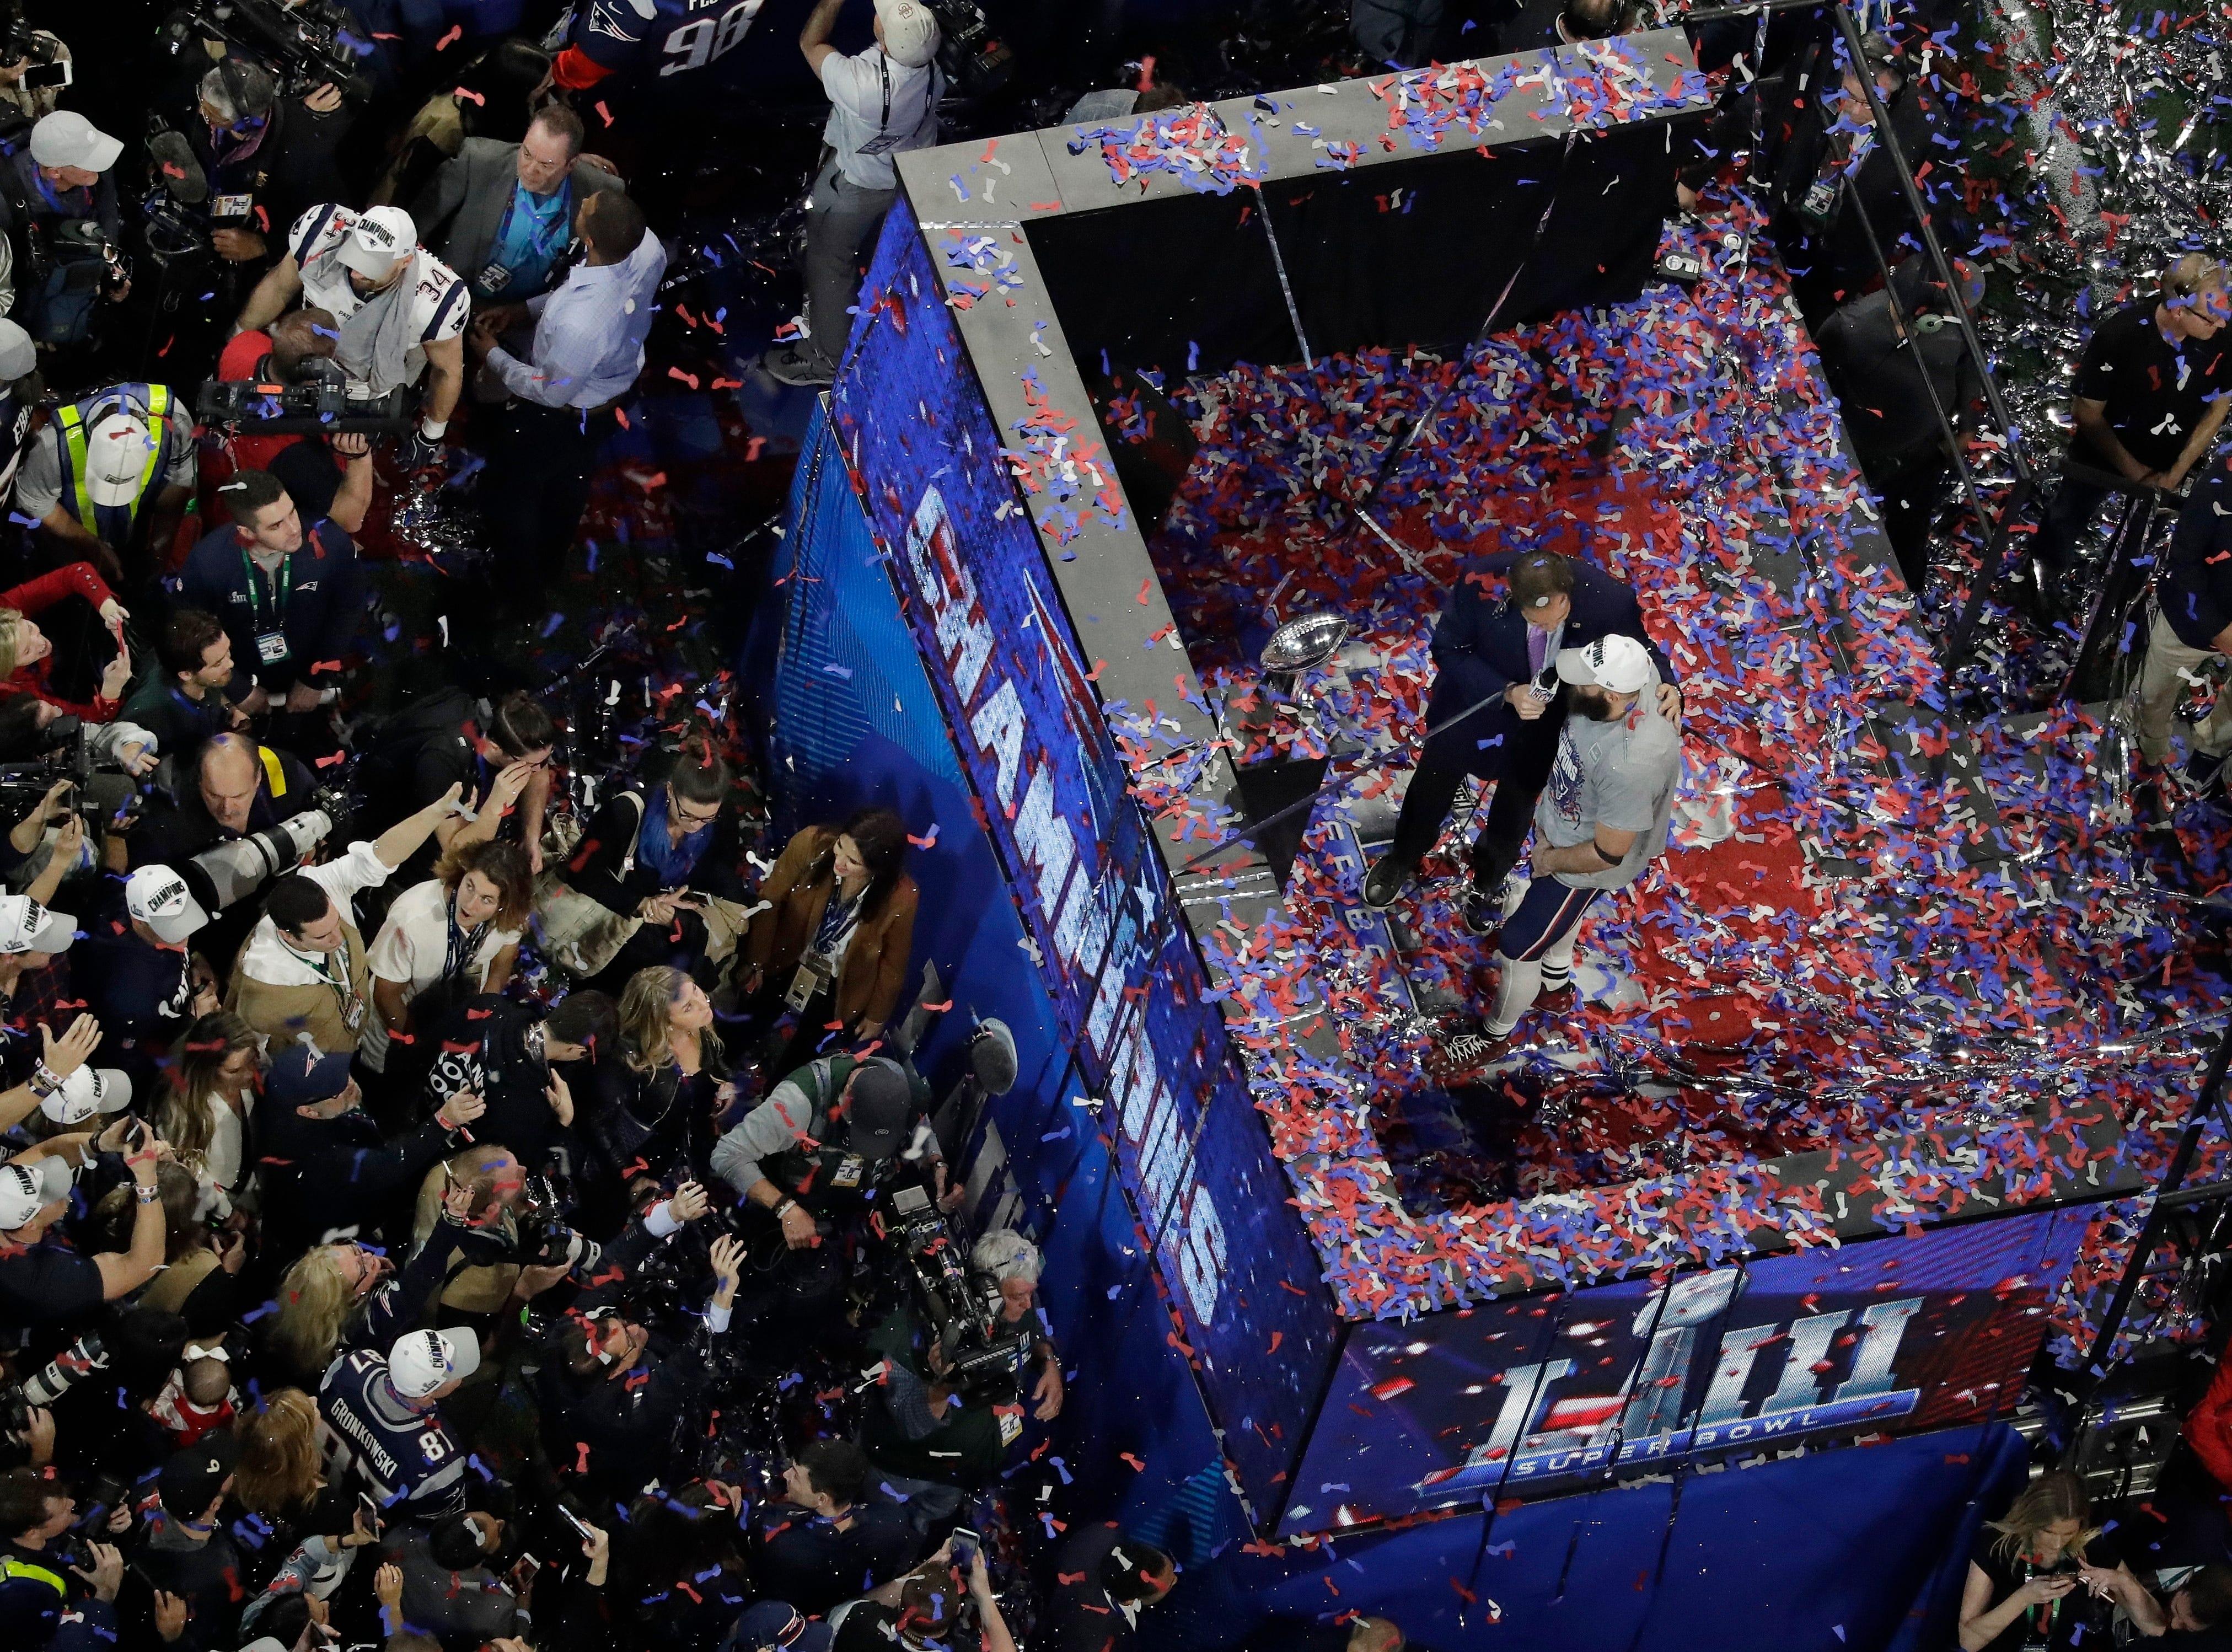 New England Patriots' Julian Edelman is interviewed after NFL Super Bowl 53.